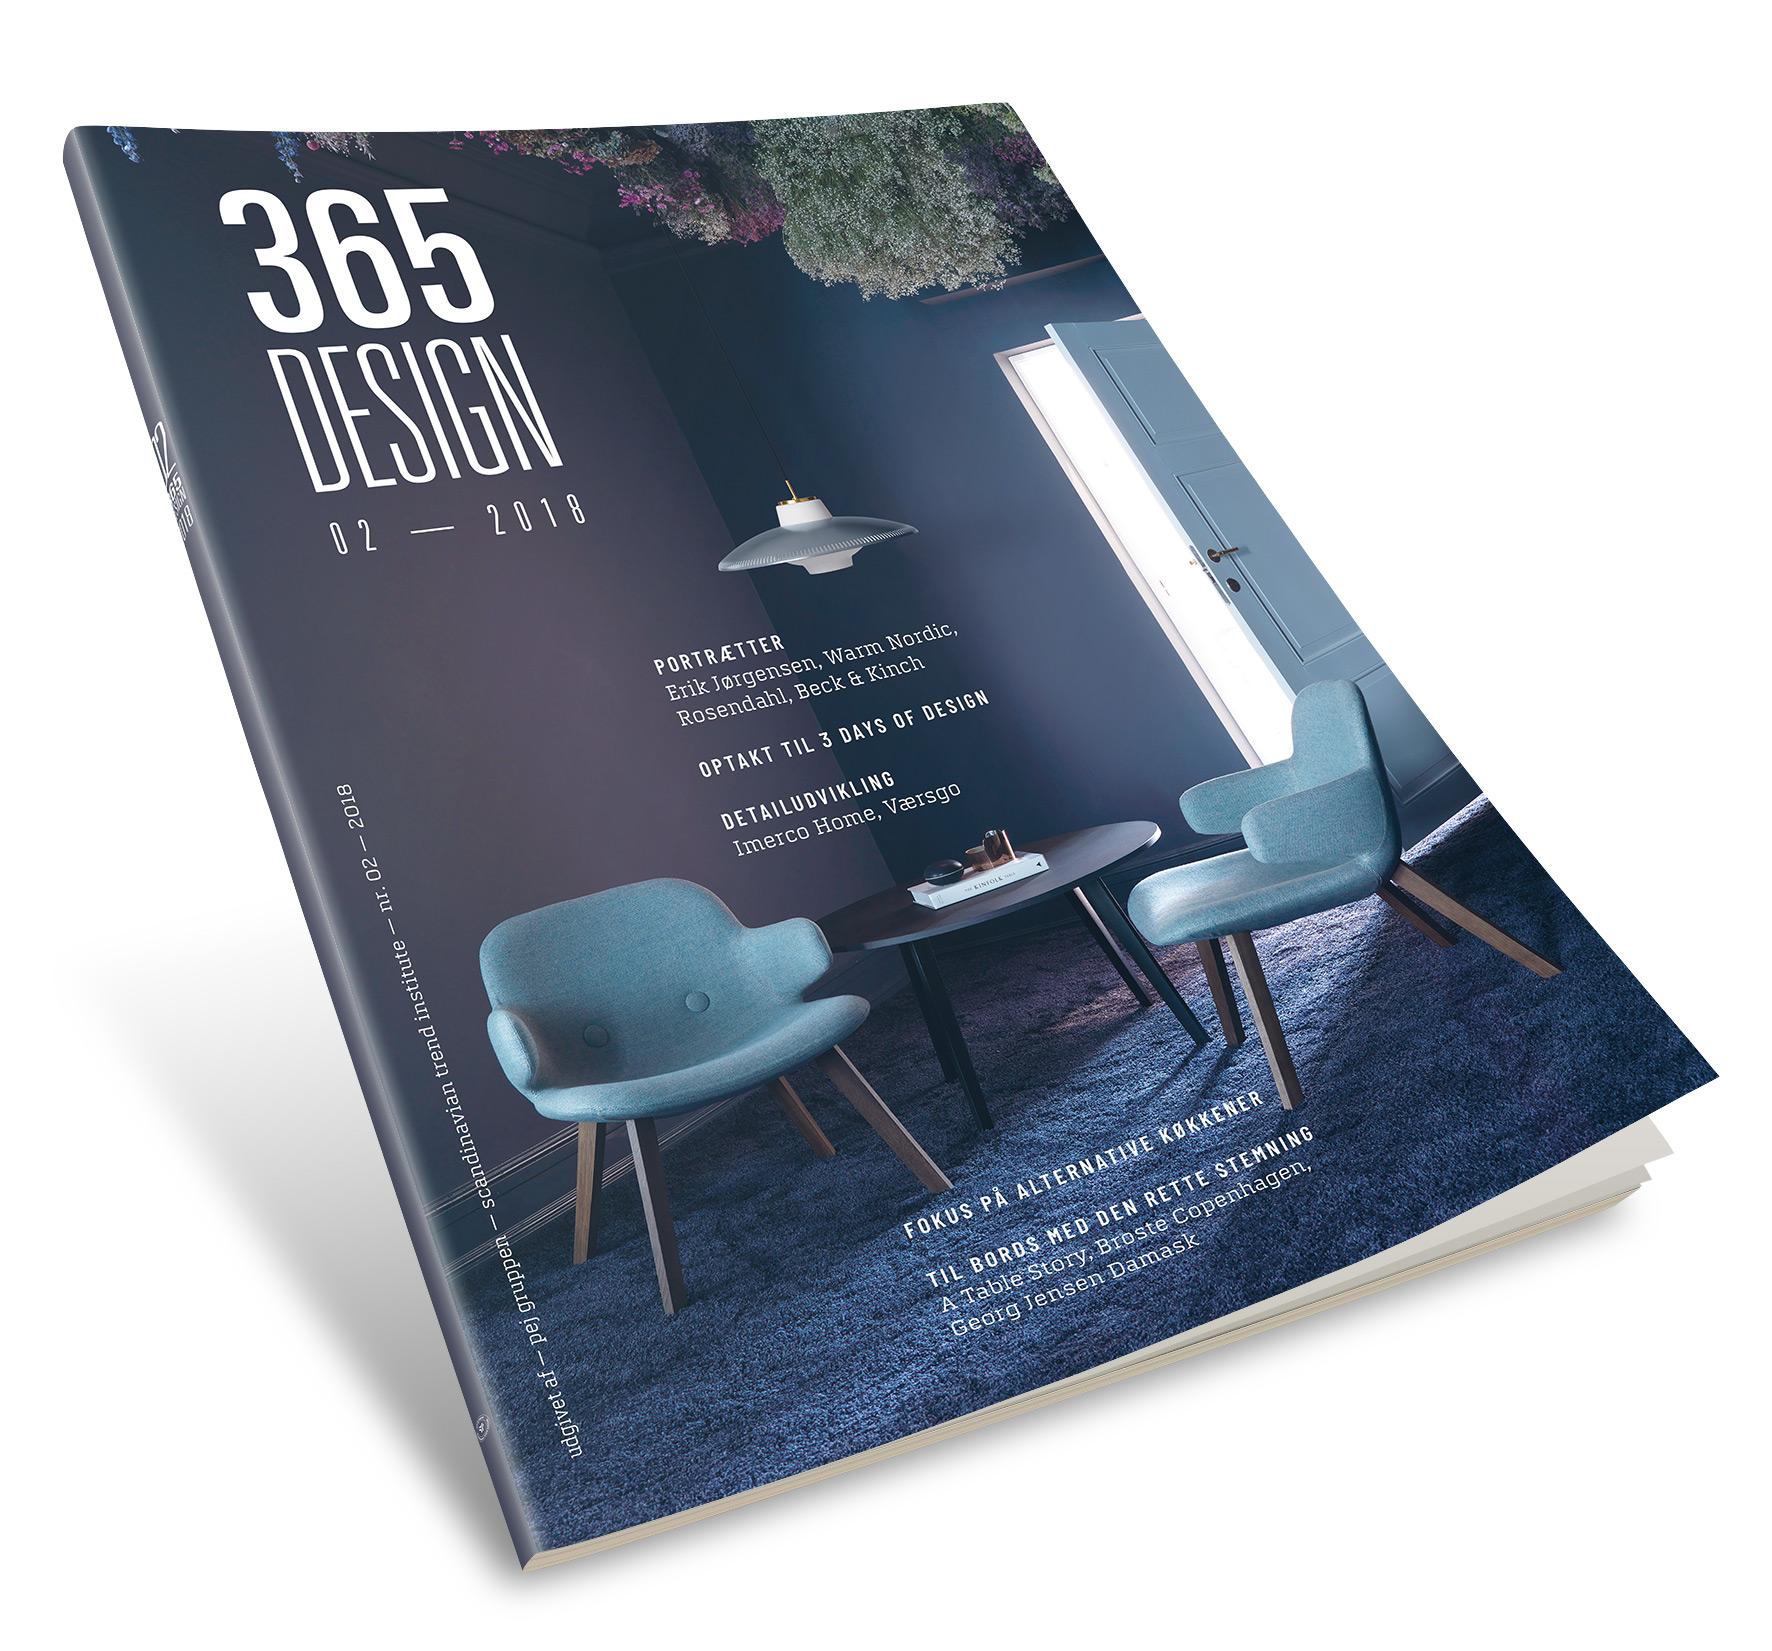 365design nr. 2 2018